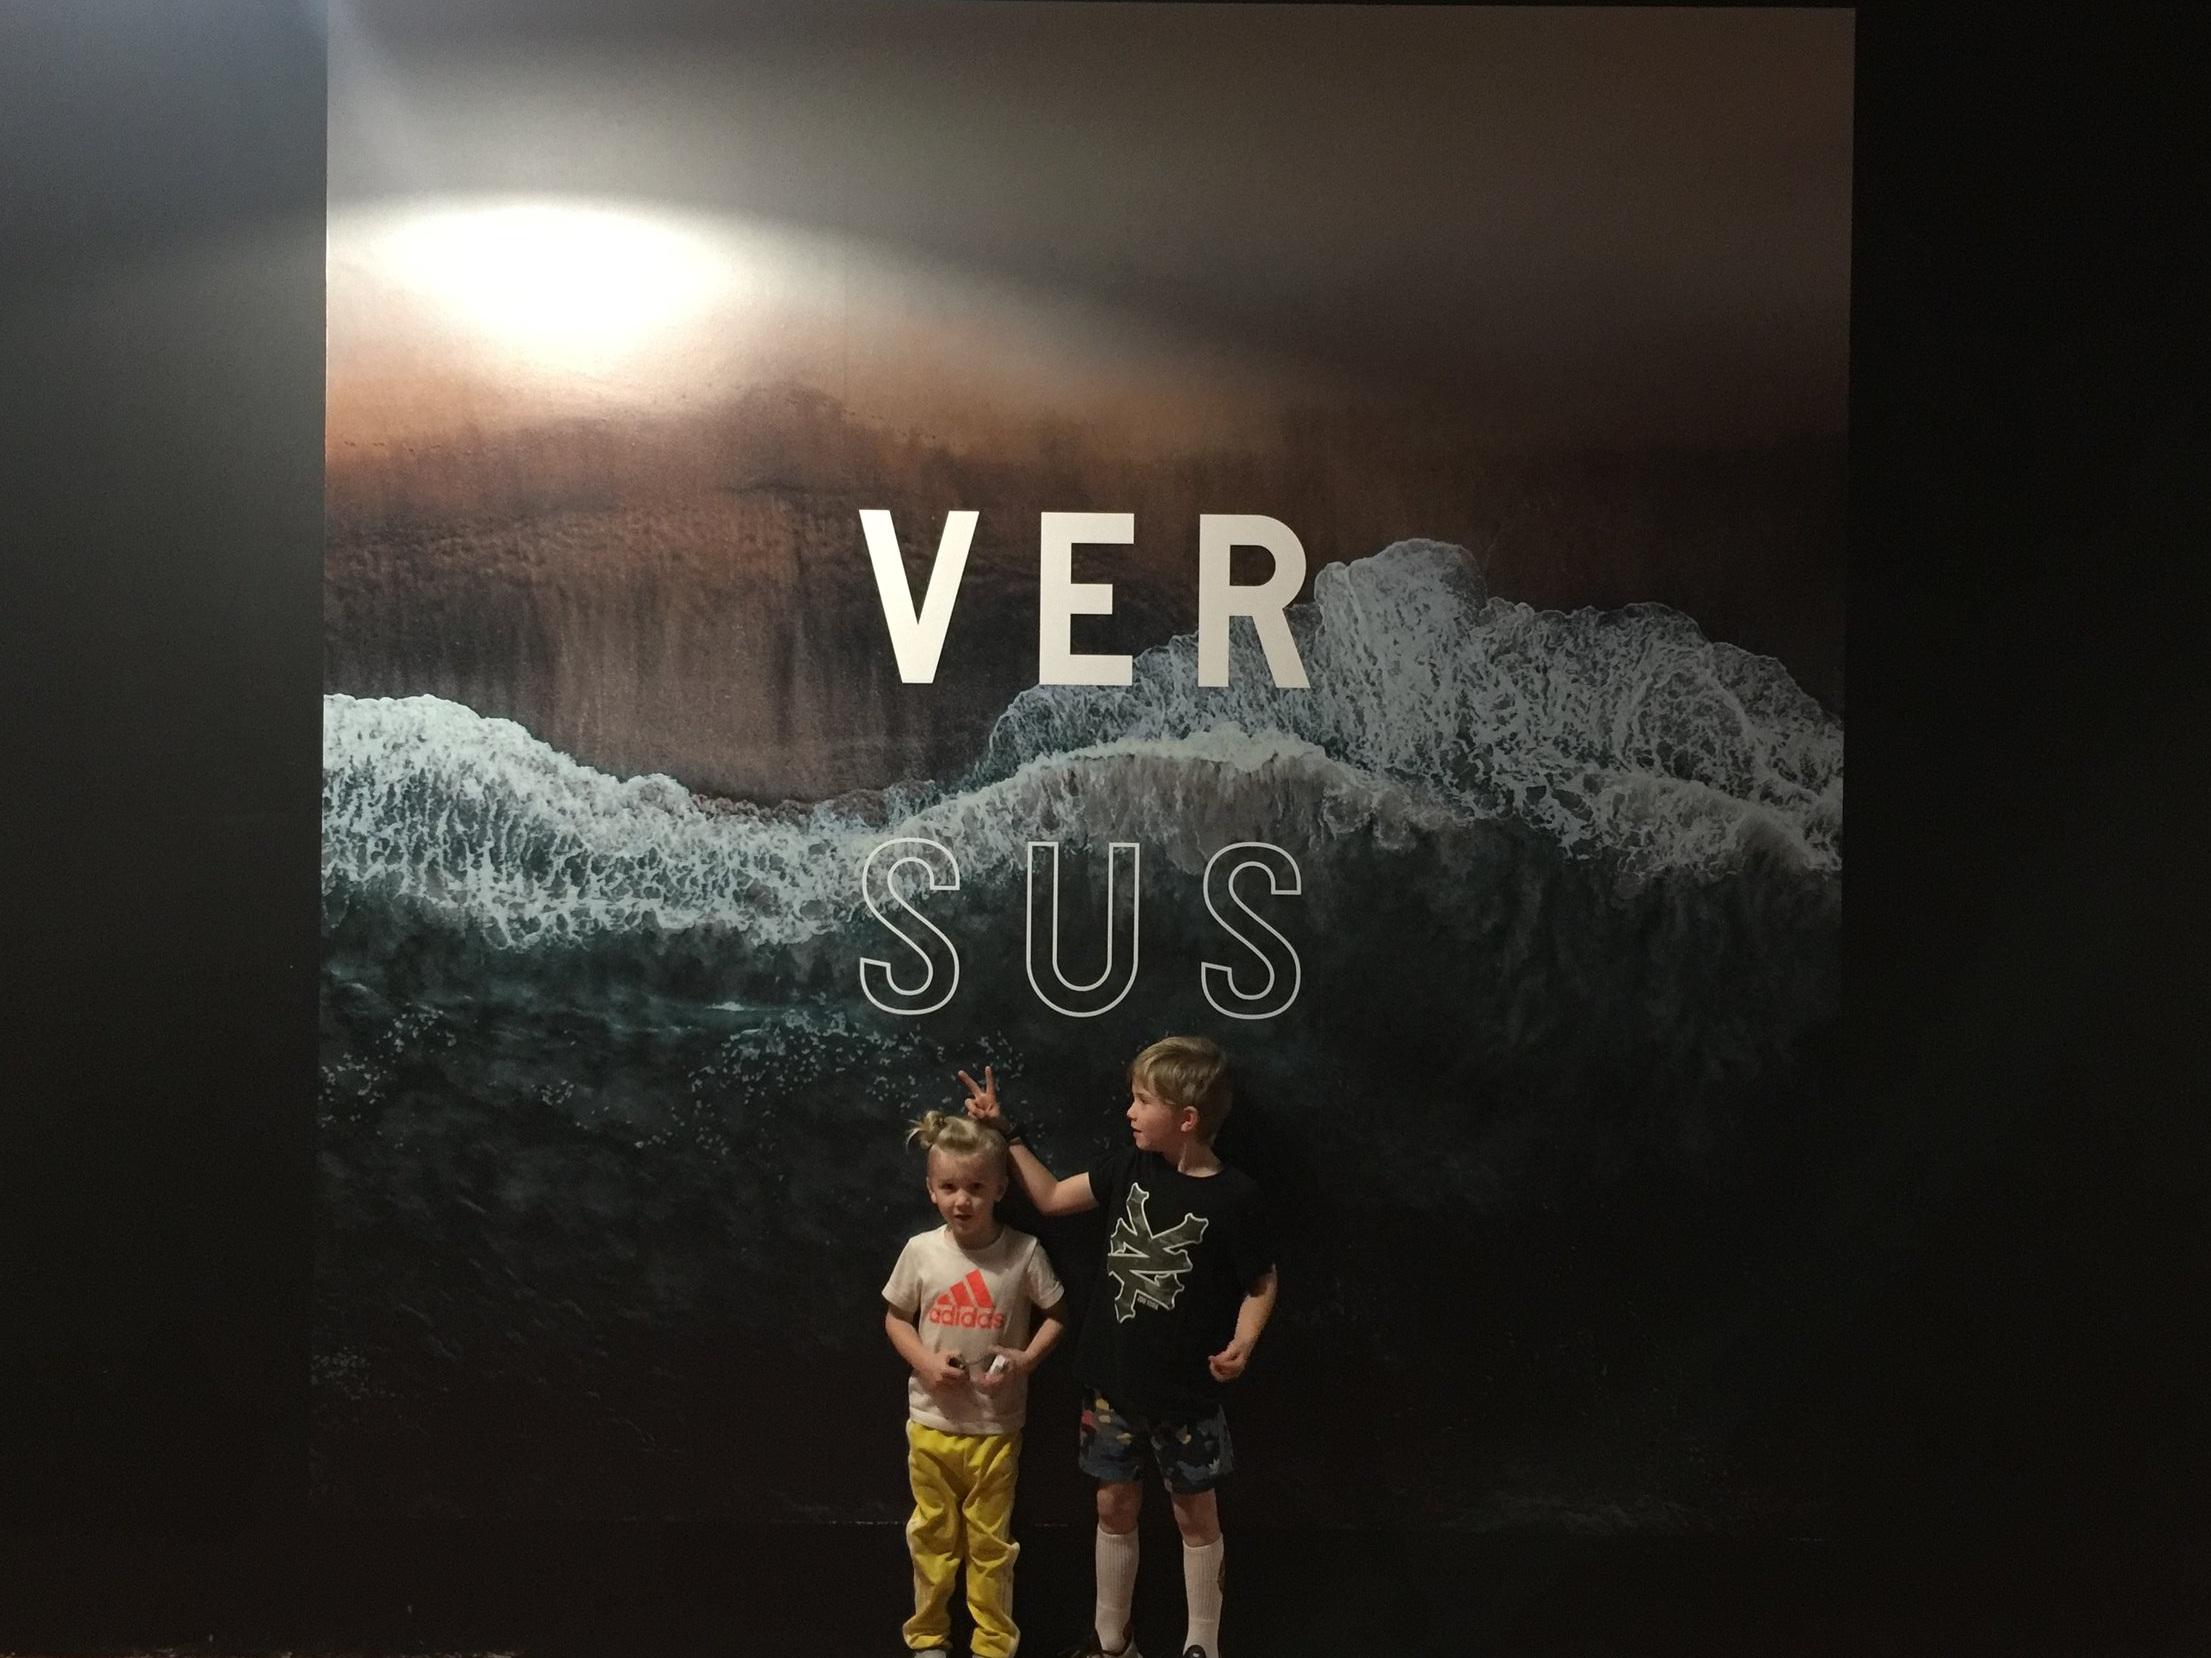 VERSUS - St. Kilda & the Armstrong boys!